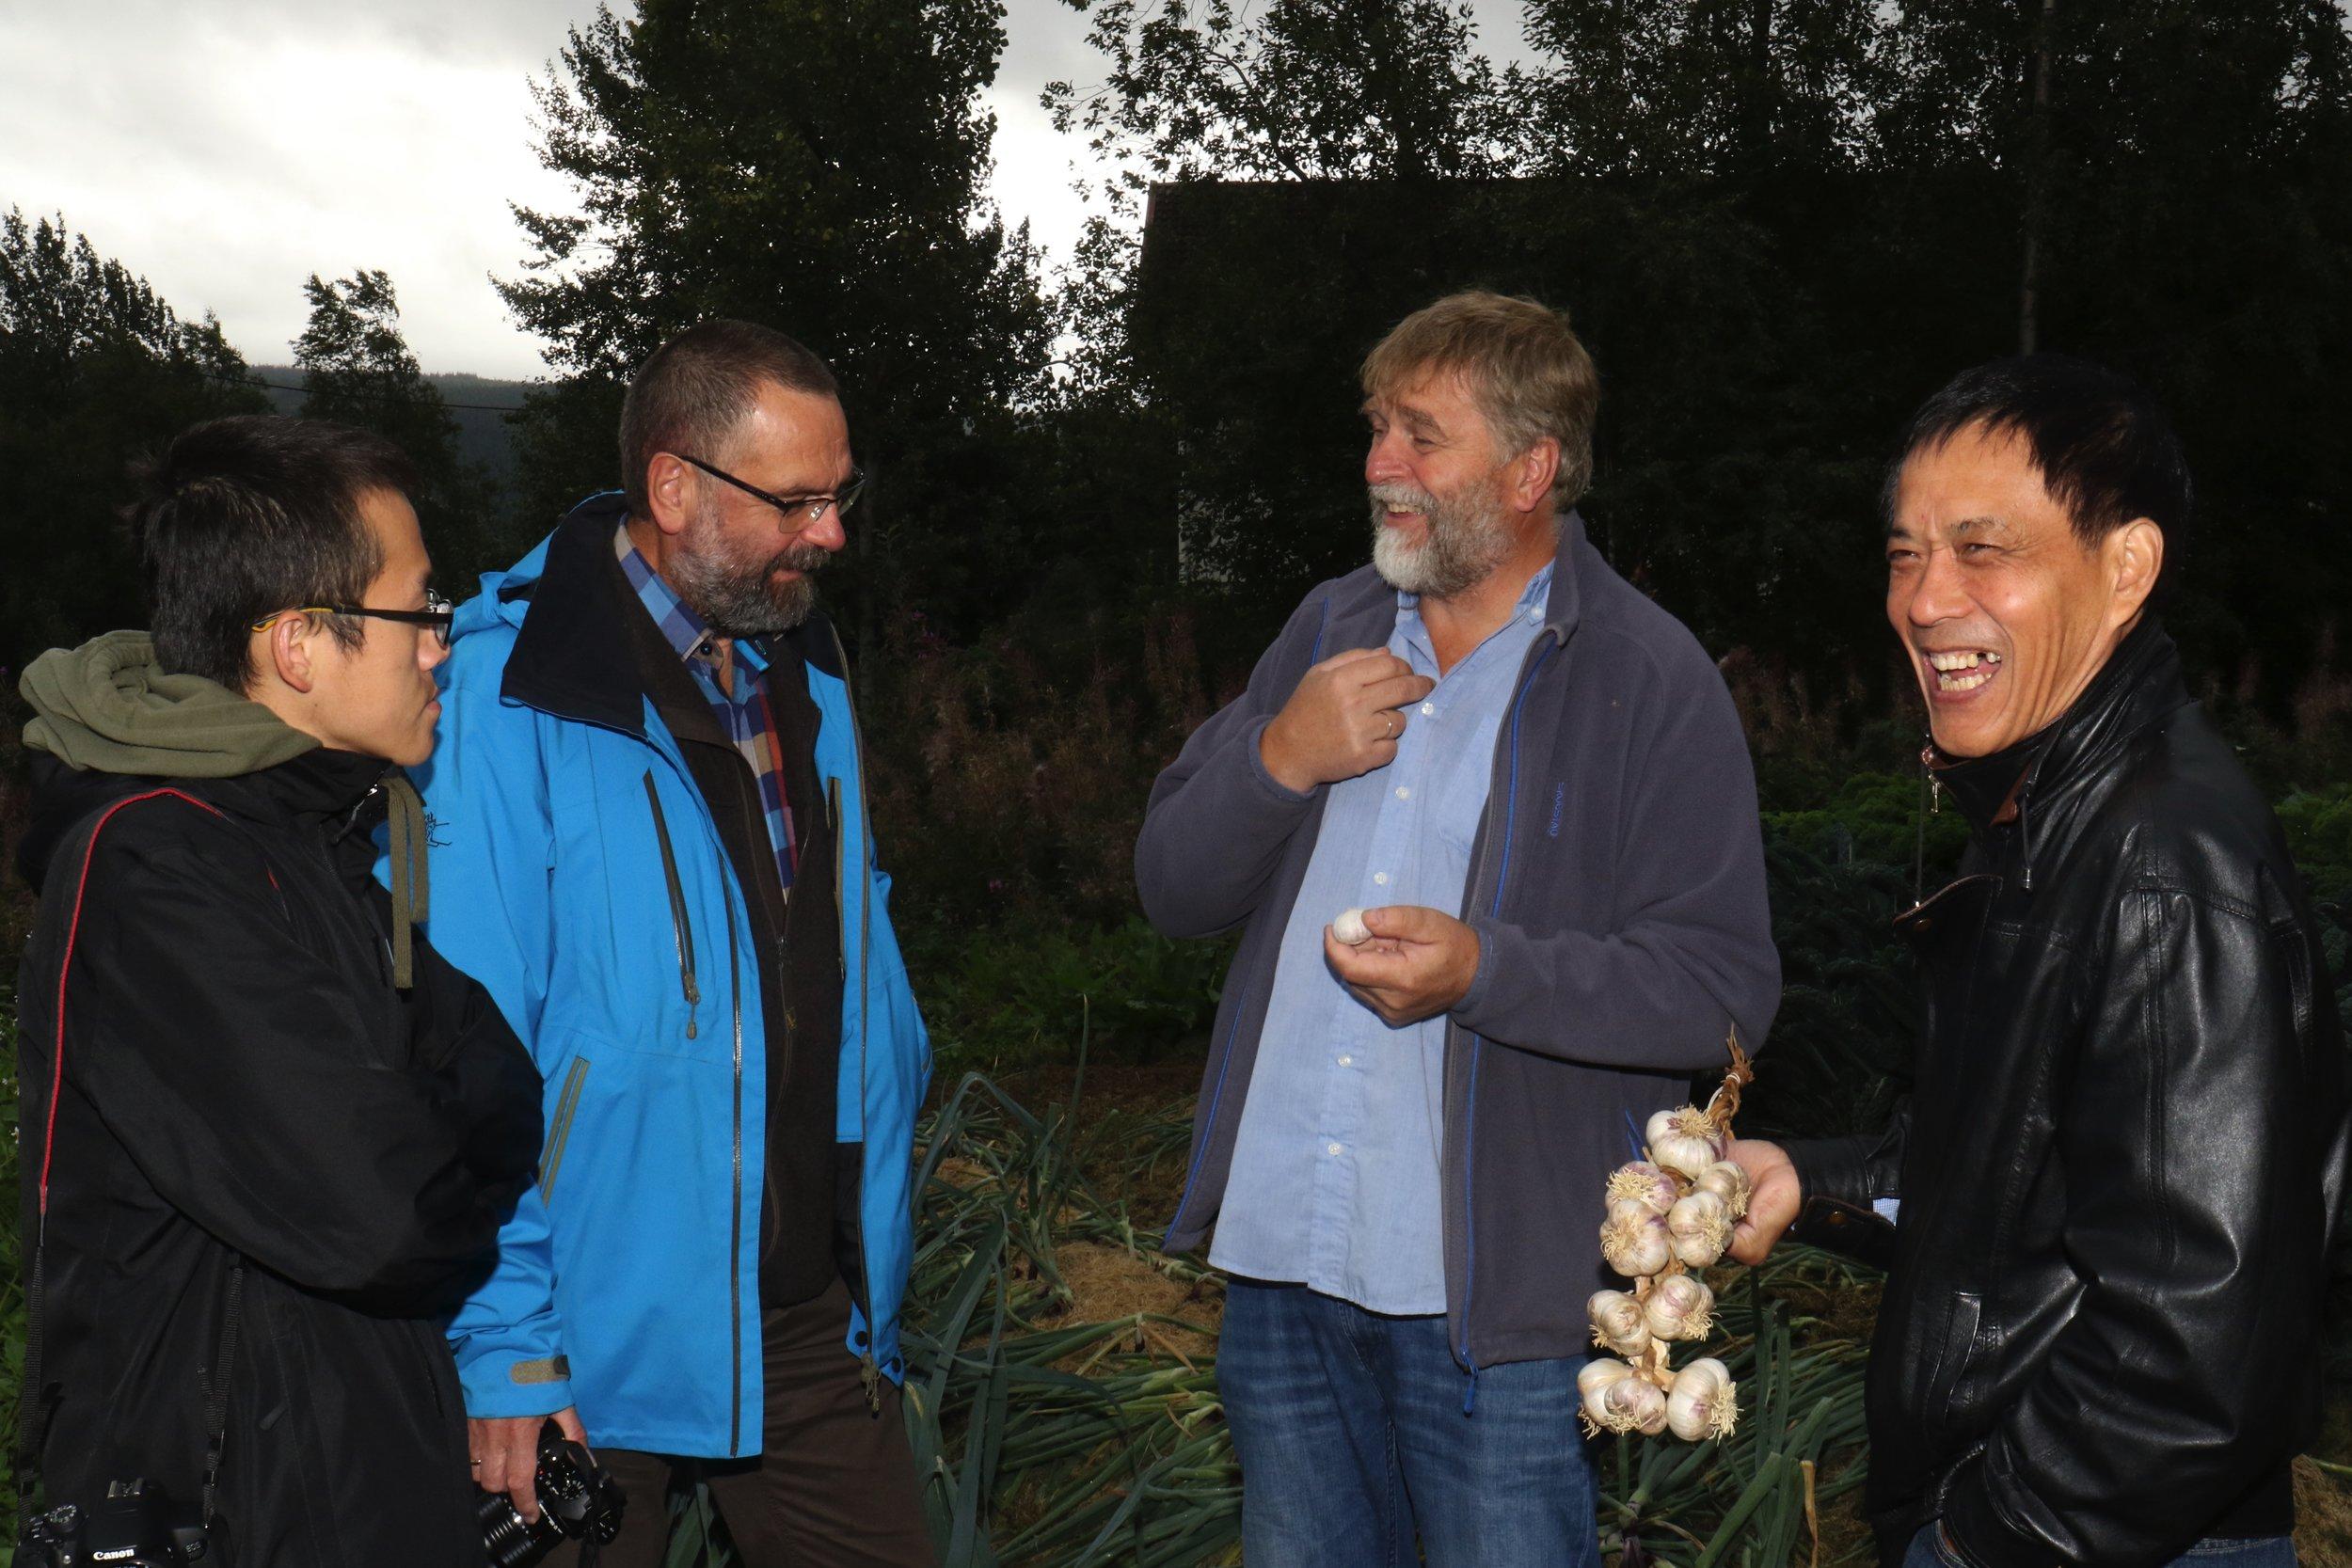 Doktorgradsstipendiat Min-Rui Wang, Dag-Ragnar Blystad forsker ved NIBIO, Anders Nordrum og professor Qiaochun Wang med normalt utviklet løk fra Beredskapshagen til Datsja.